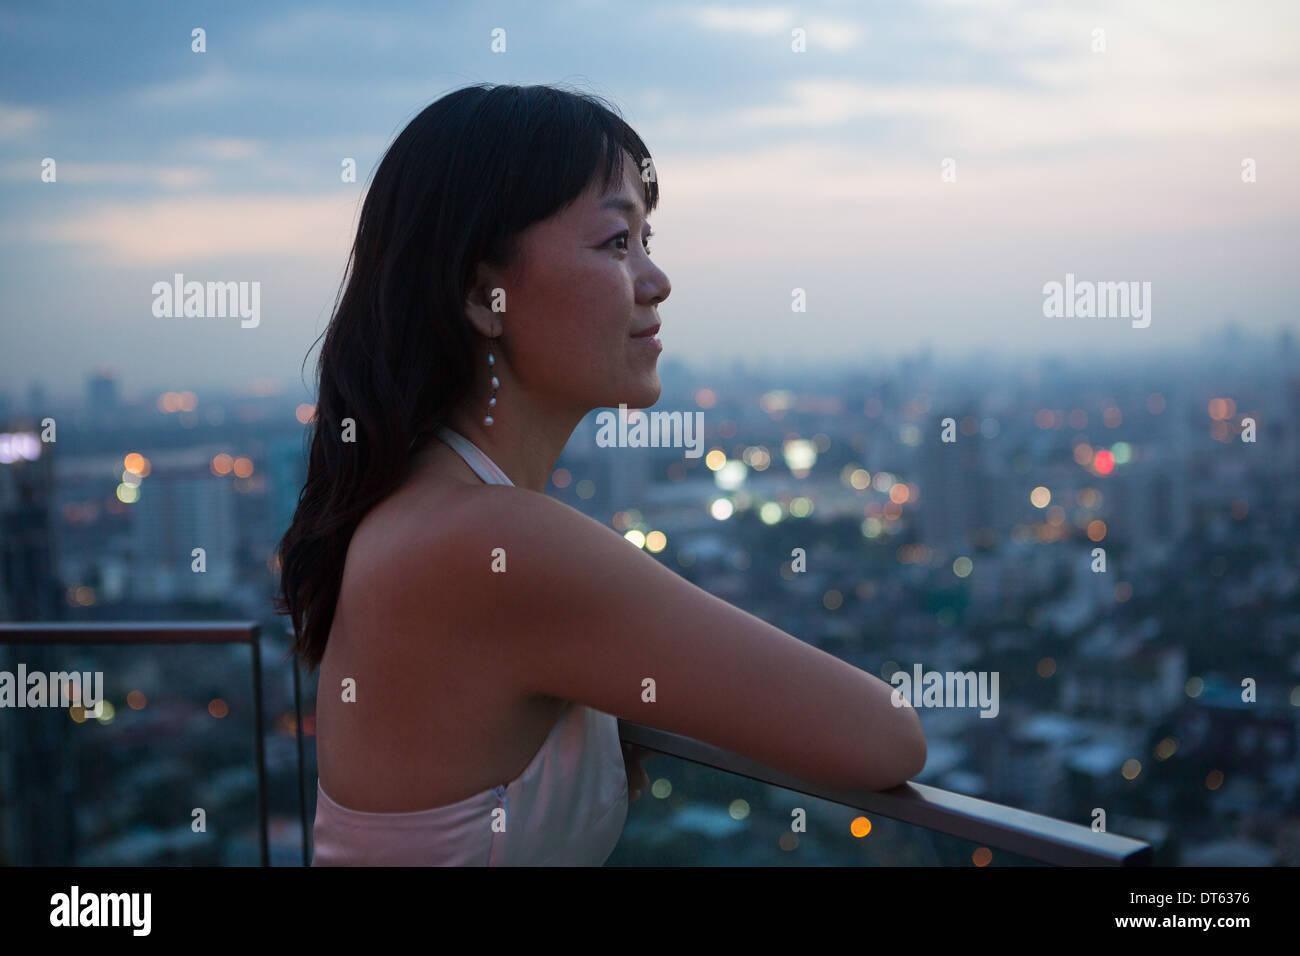 Woman on balcony, Bangkok, Thailand - Stock Image